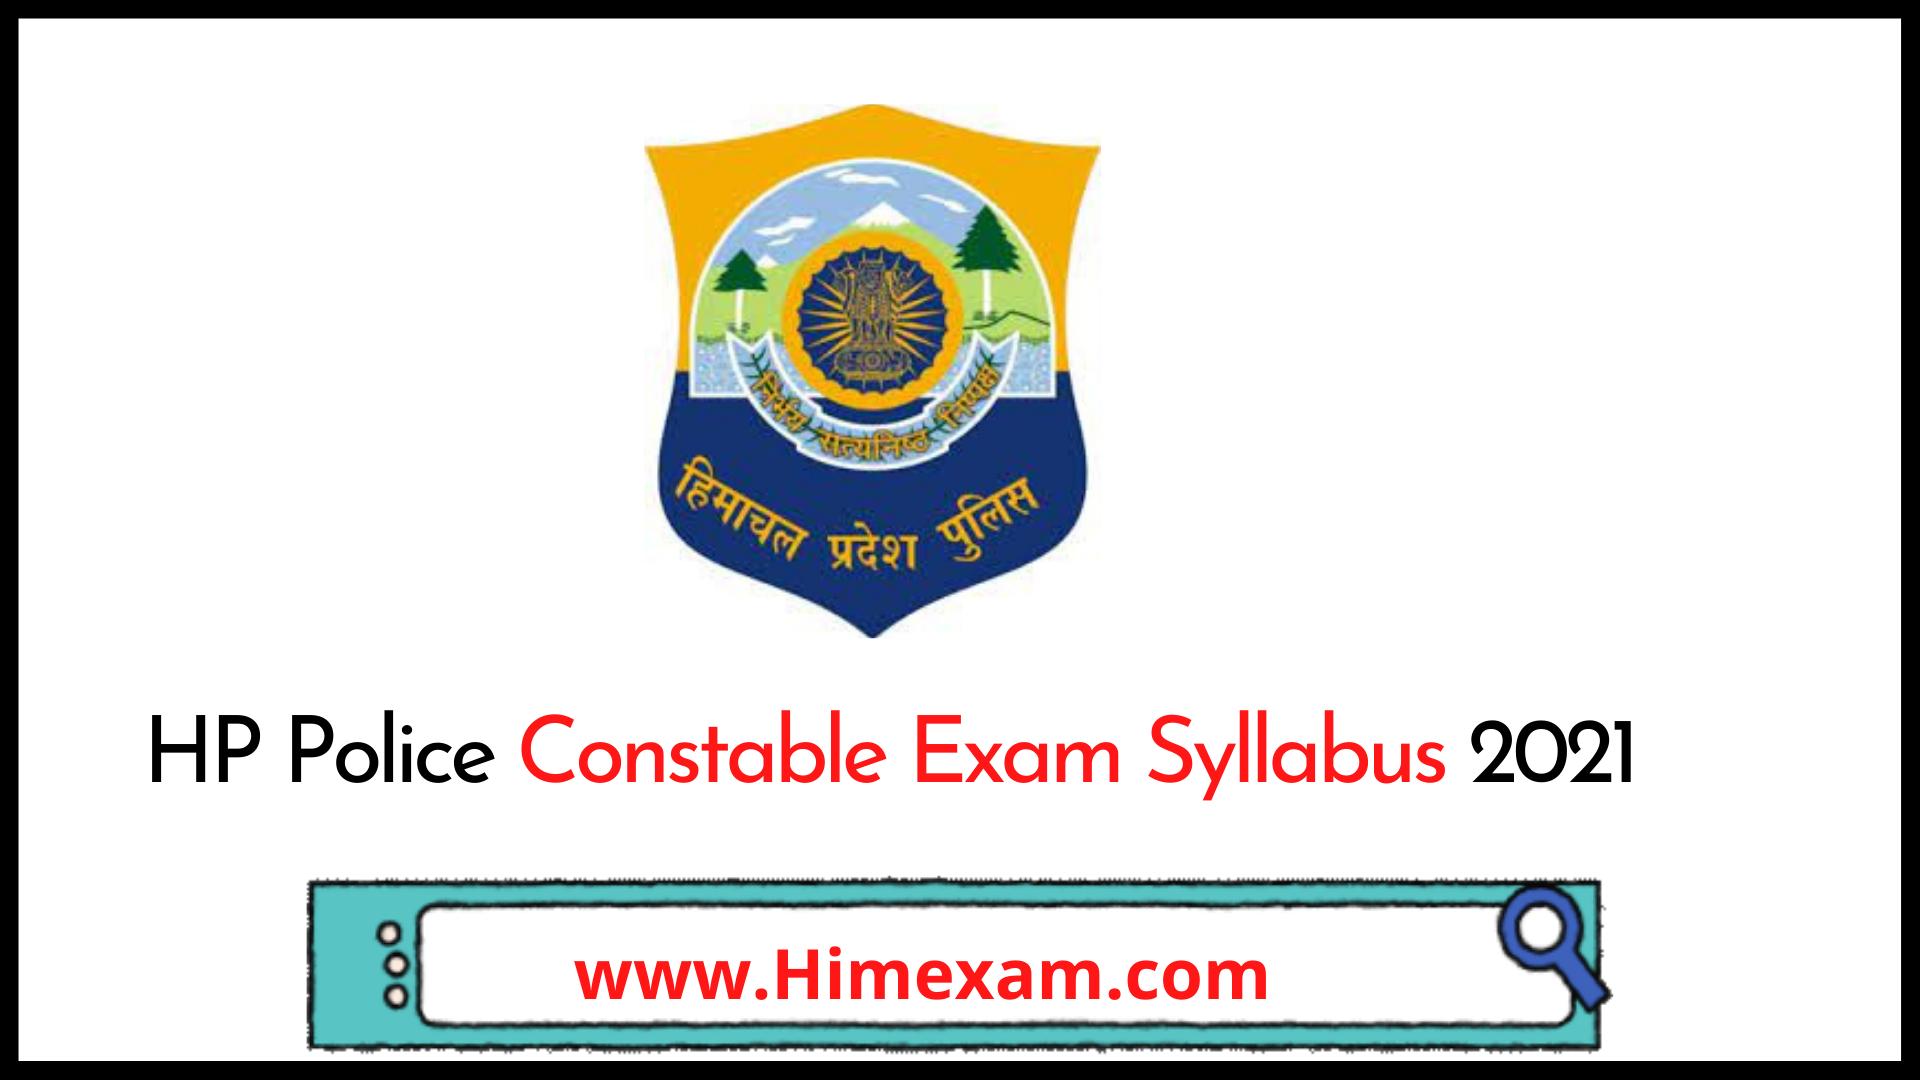 HP Police Constable Exam Syllabus 2021